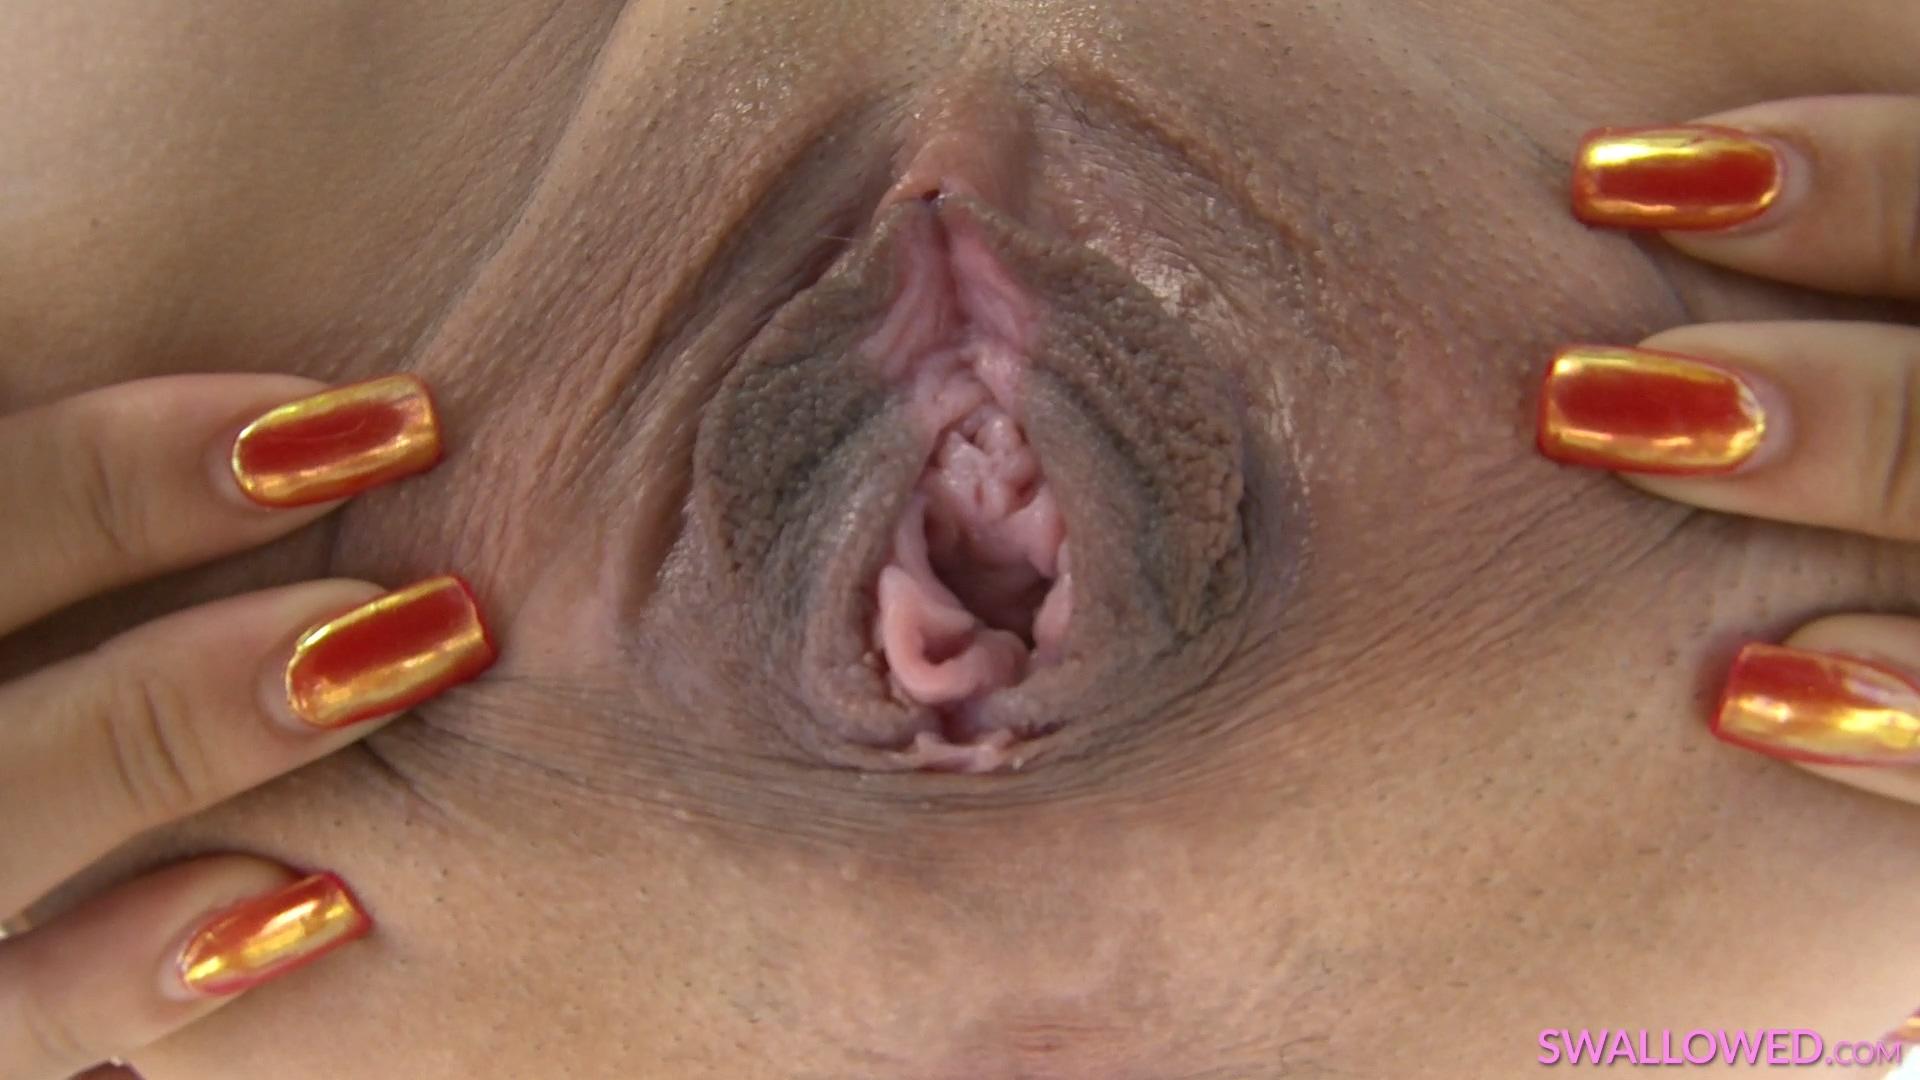 swallowed_19_10_26_allie_addison_and_iris_ivy_mp4_20191107_145614_814.jpg